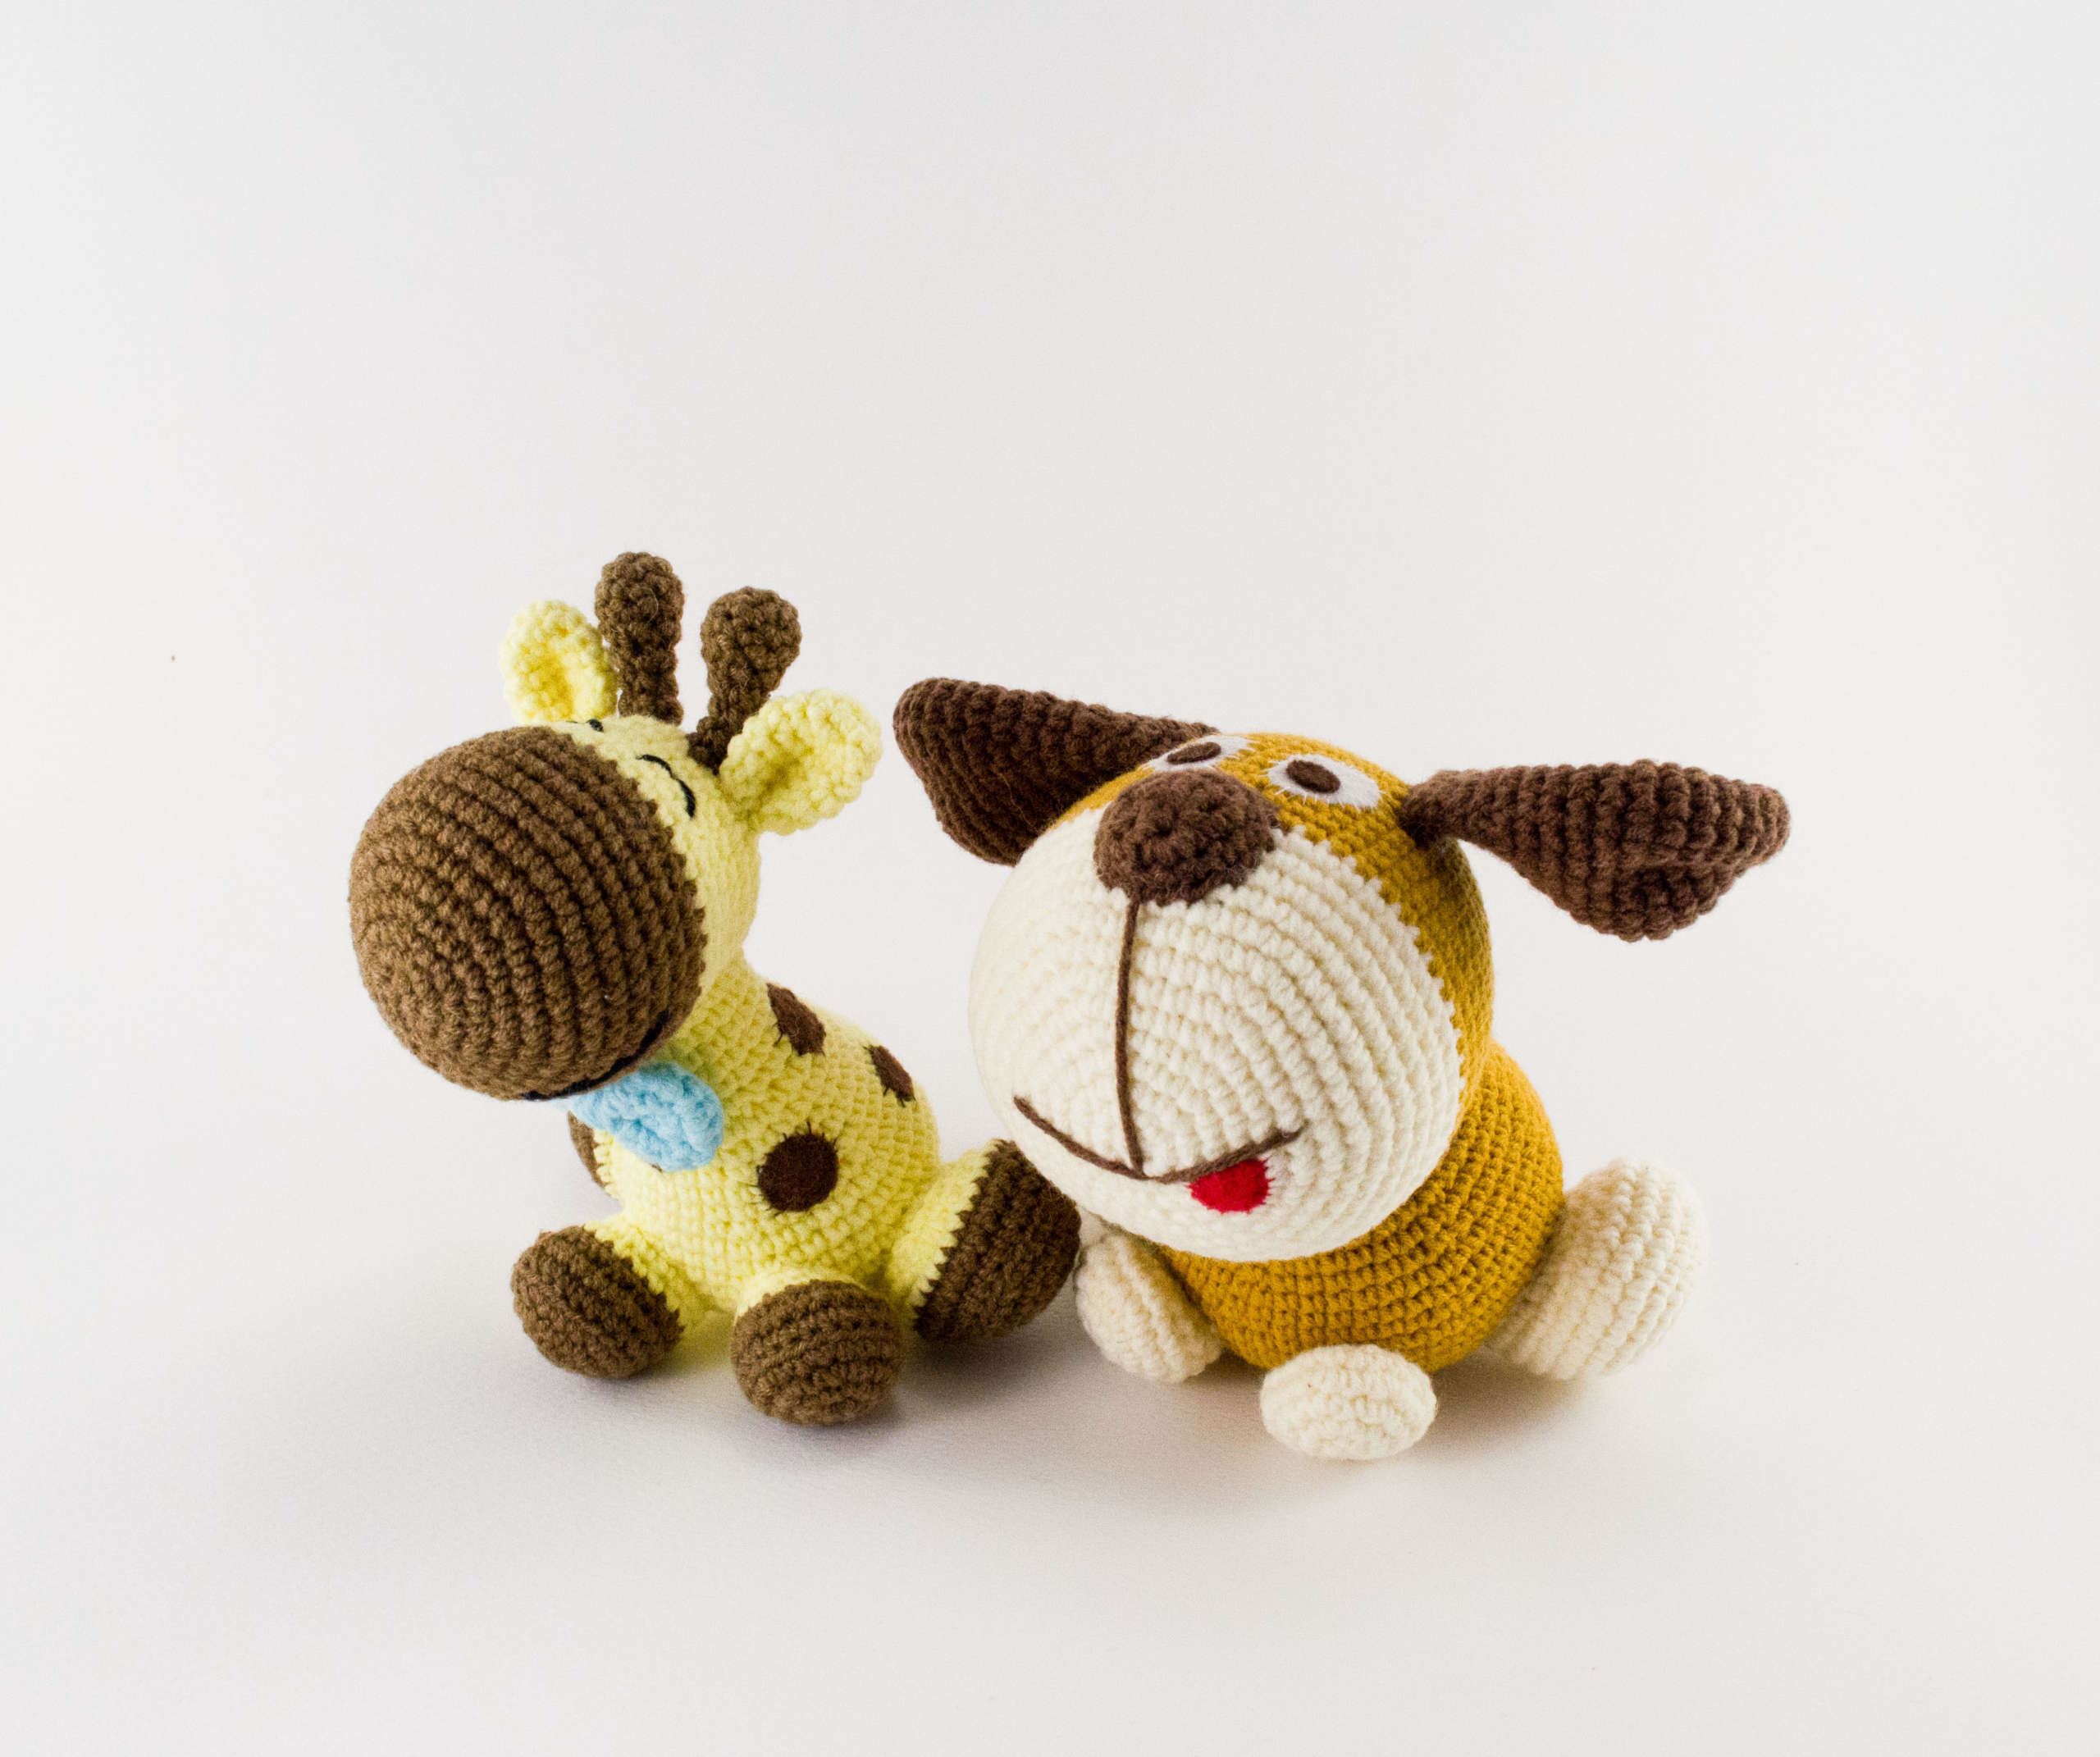 crochet dog and giraffe pattern